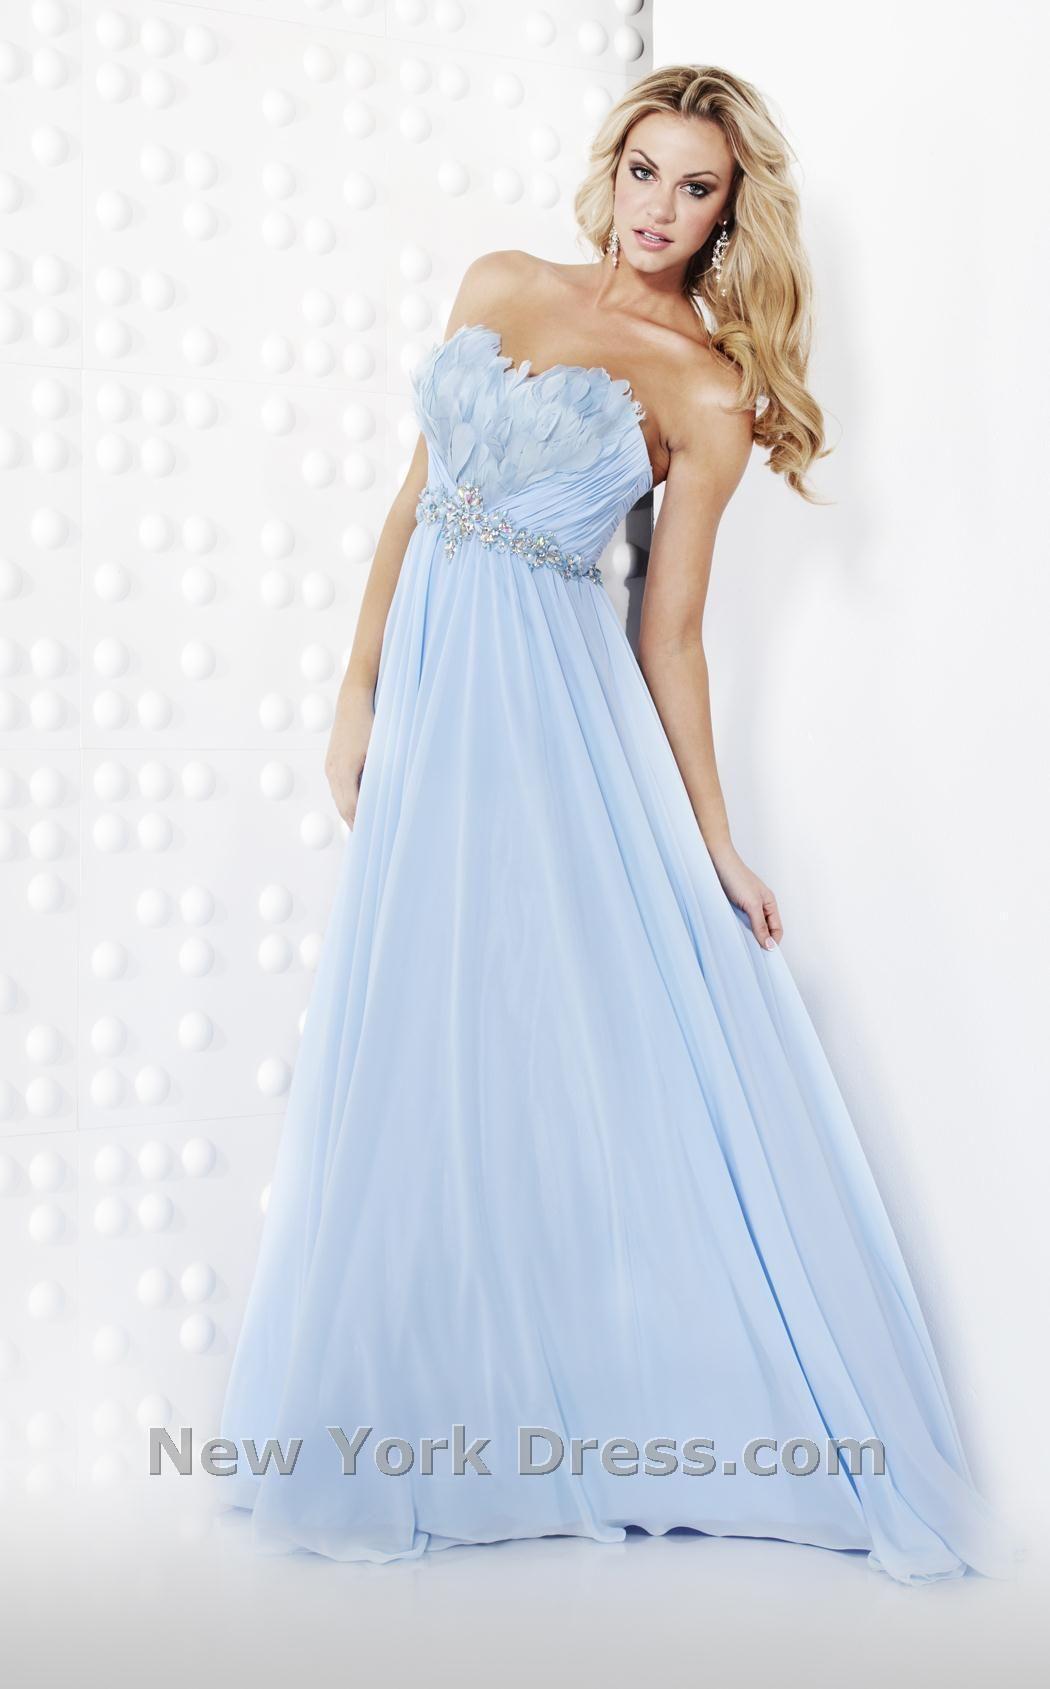 Riva dress r military ball graduation dresses and pretty clothes